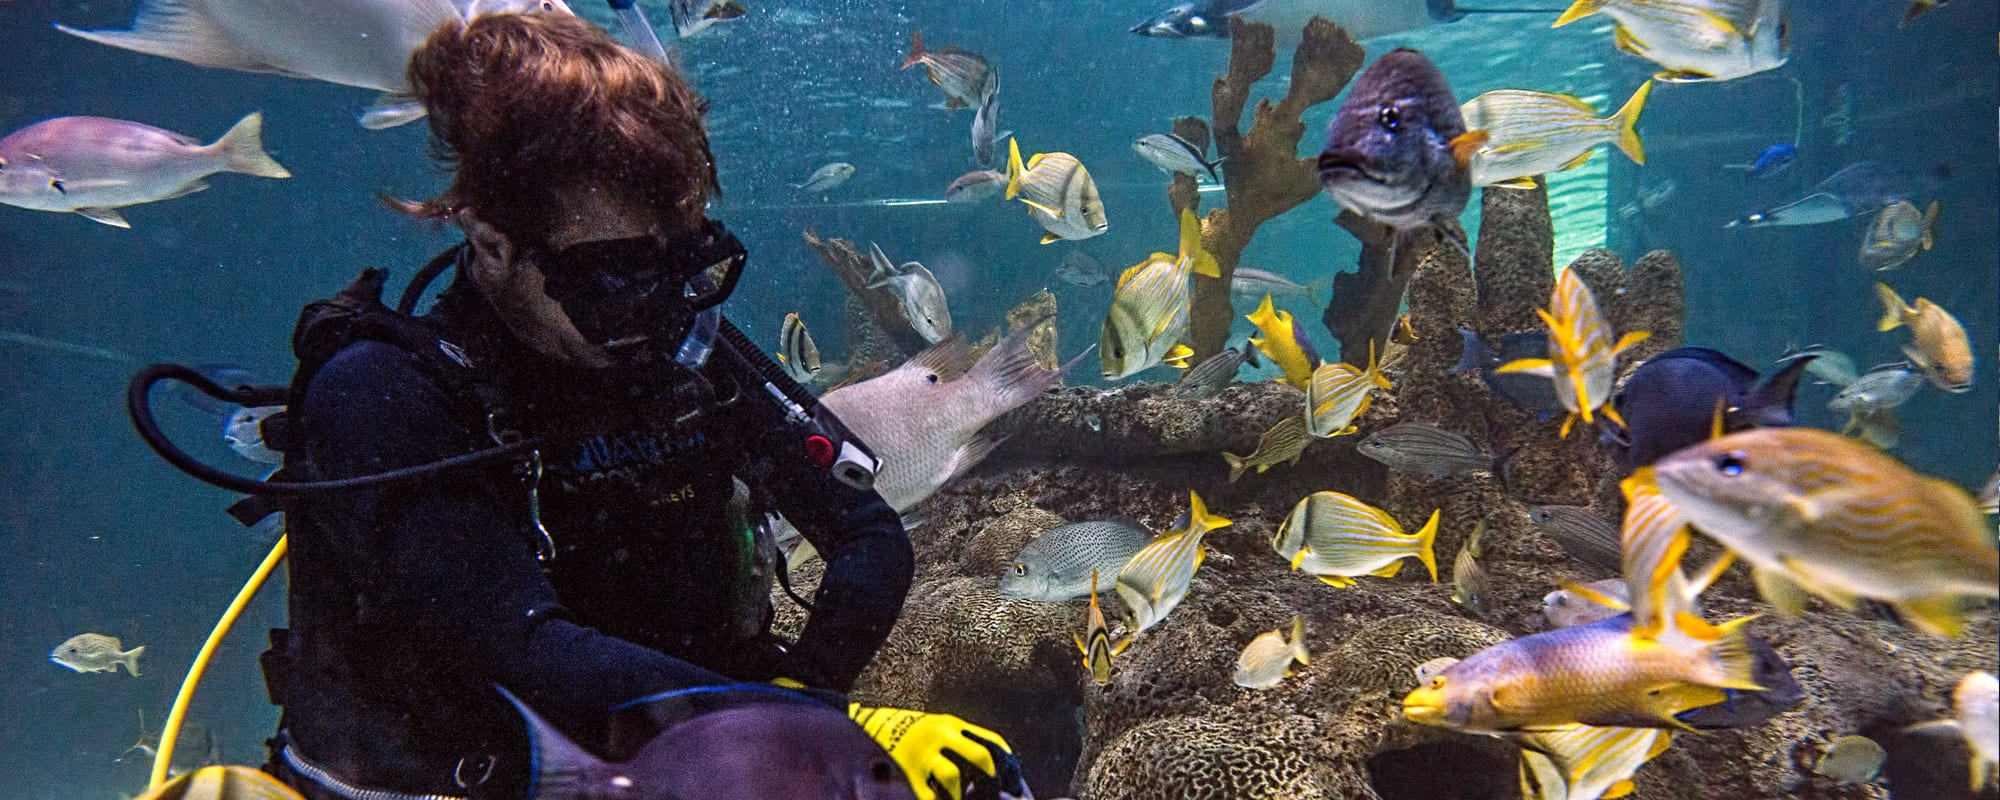 Coral Reef Regulator Florida Keys Aquarium Encounters